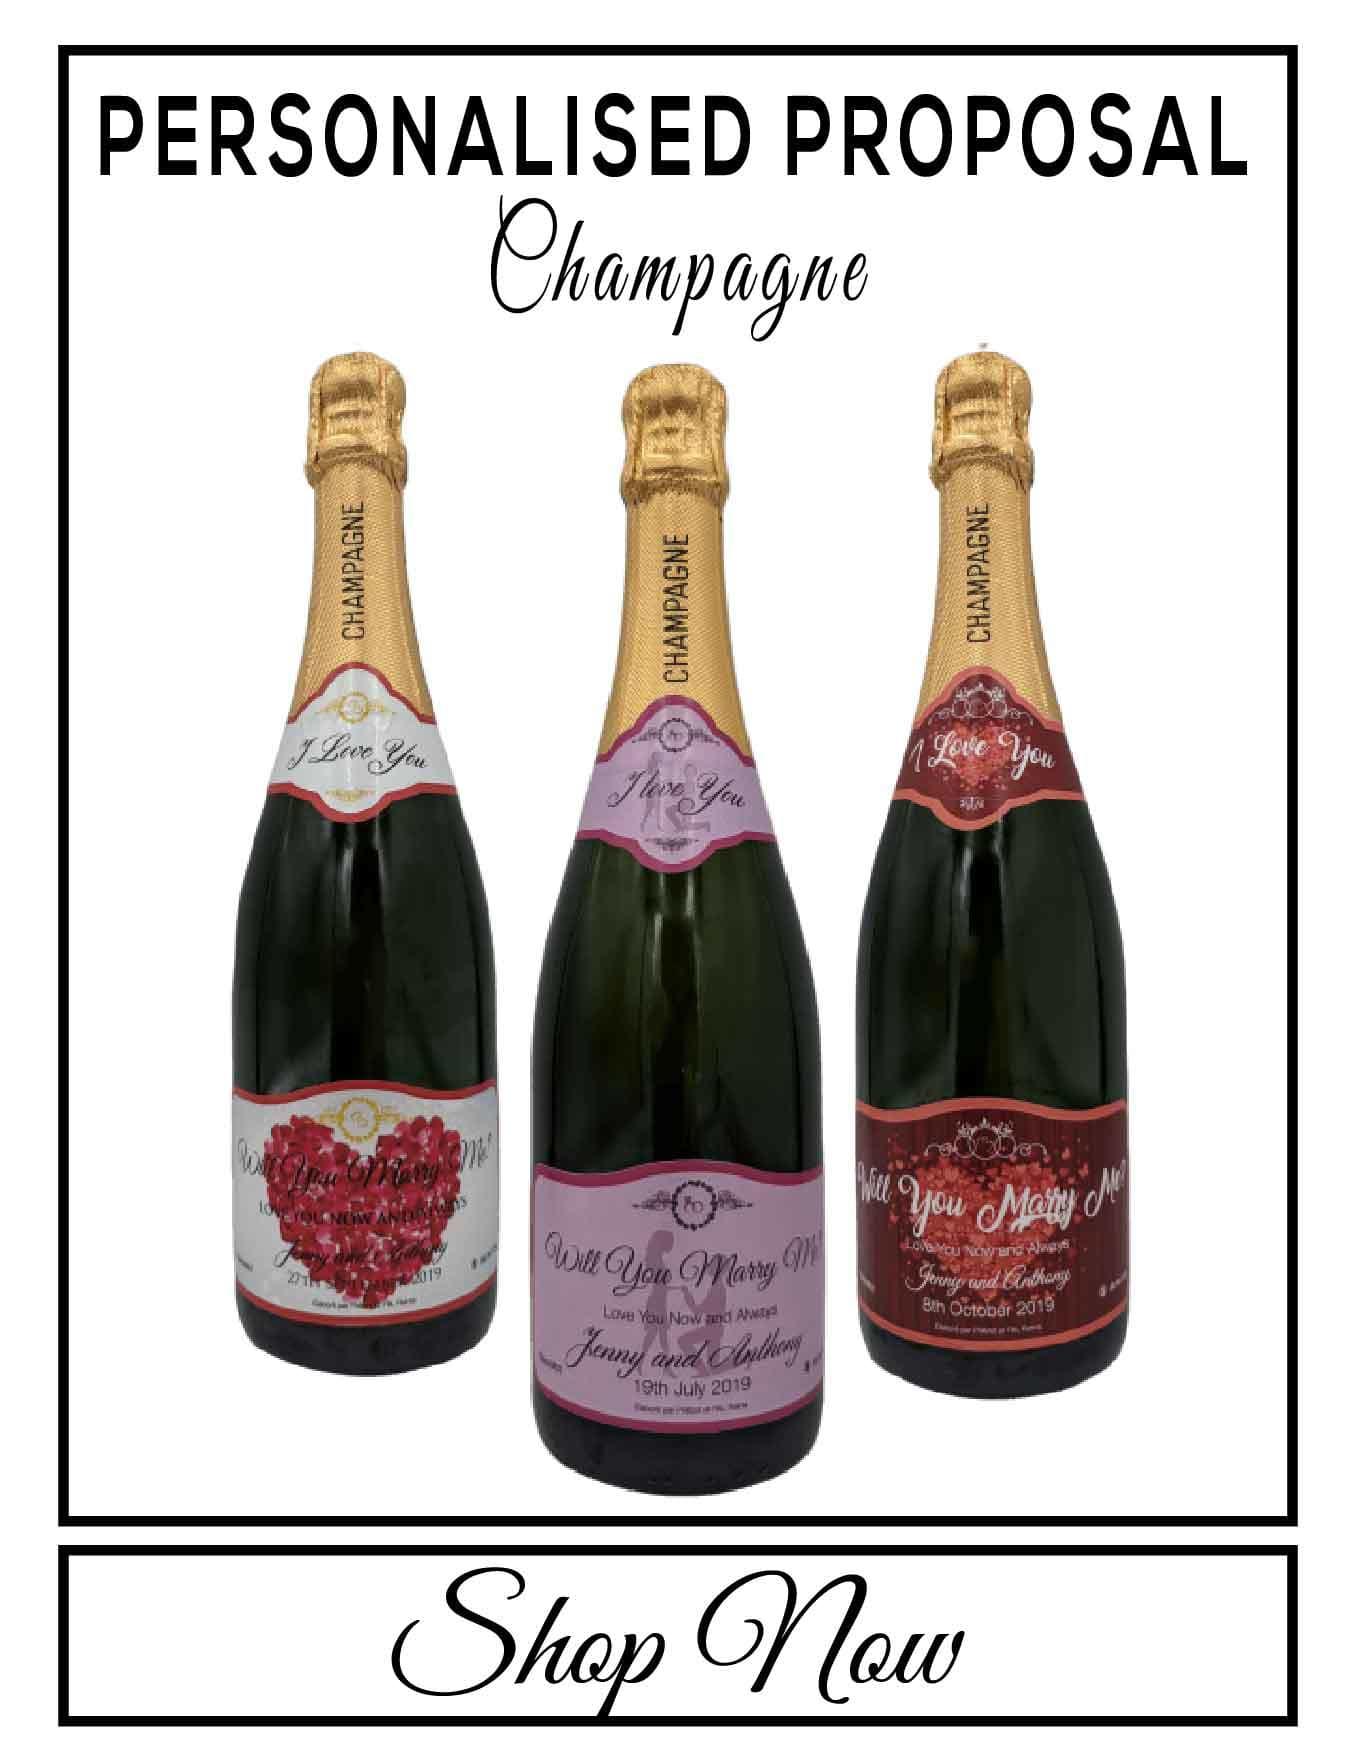 personalised Champagne customised bottle label delivery uk sparkling wine engagement engaged gift present bespoke unique